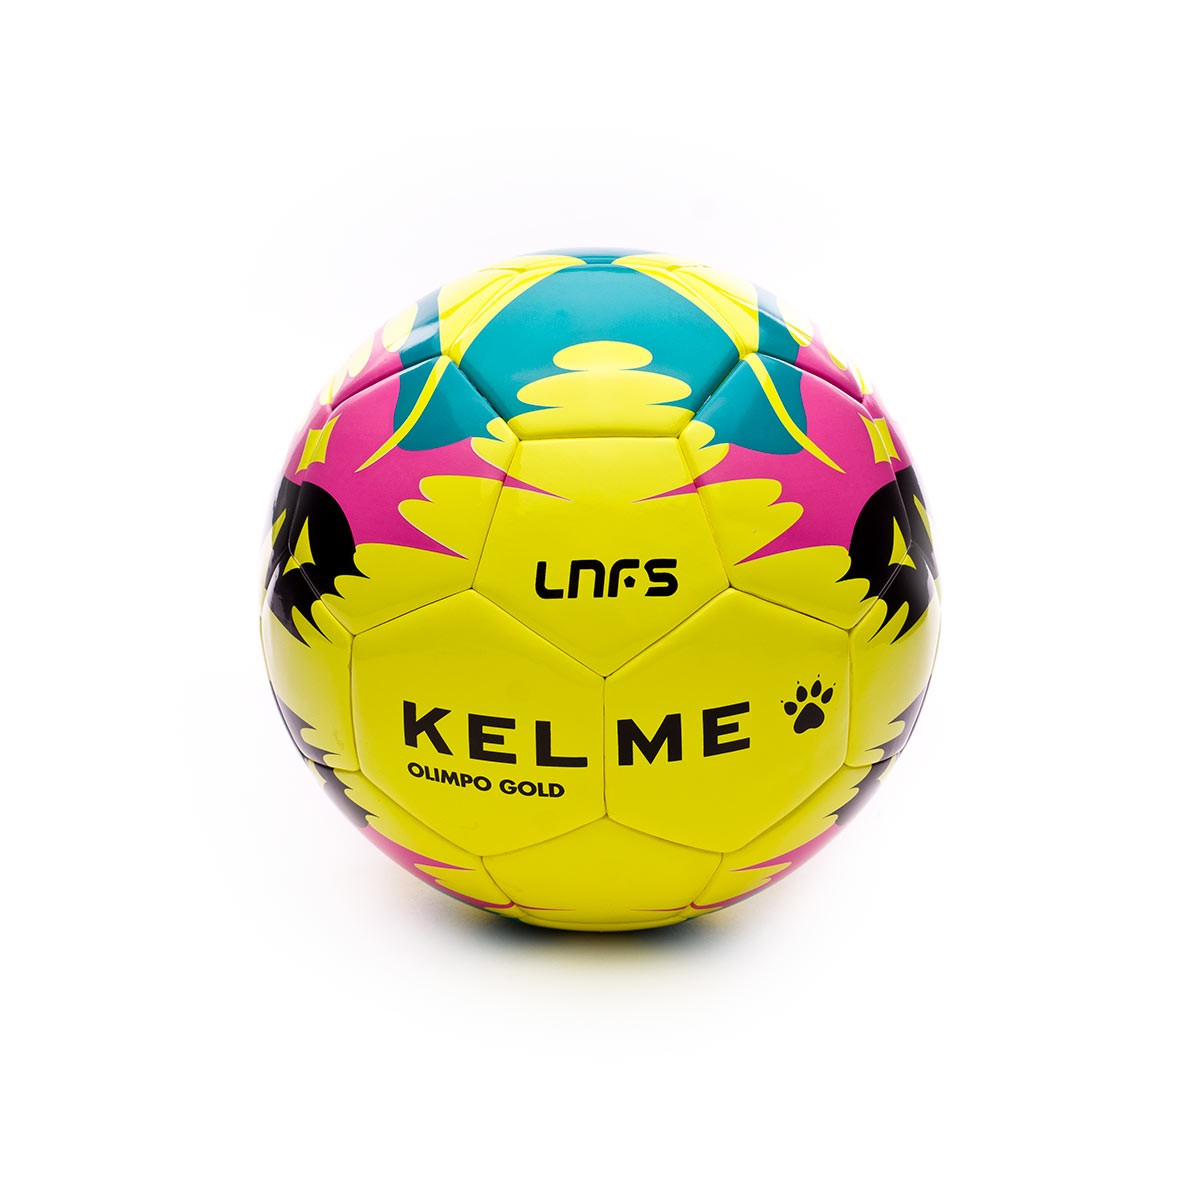 f416ac9fb116a Balón Kelme Olimpo Gold Replica LNFS 2017-2018 Amarillo - Tienda de fútbol  Fútbol Emotion